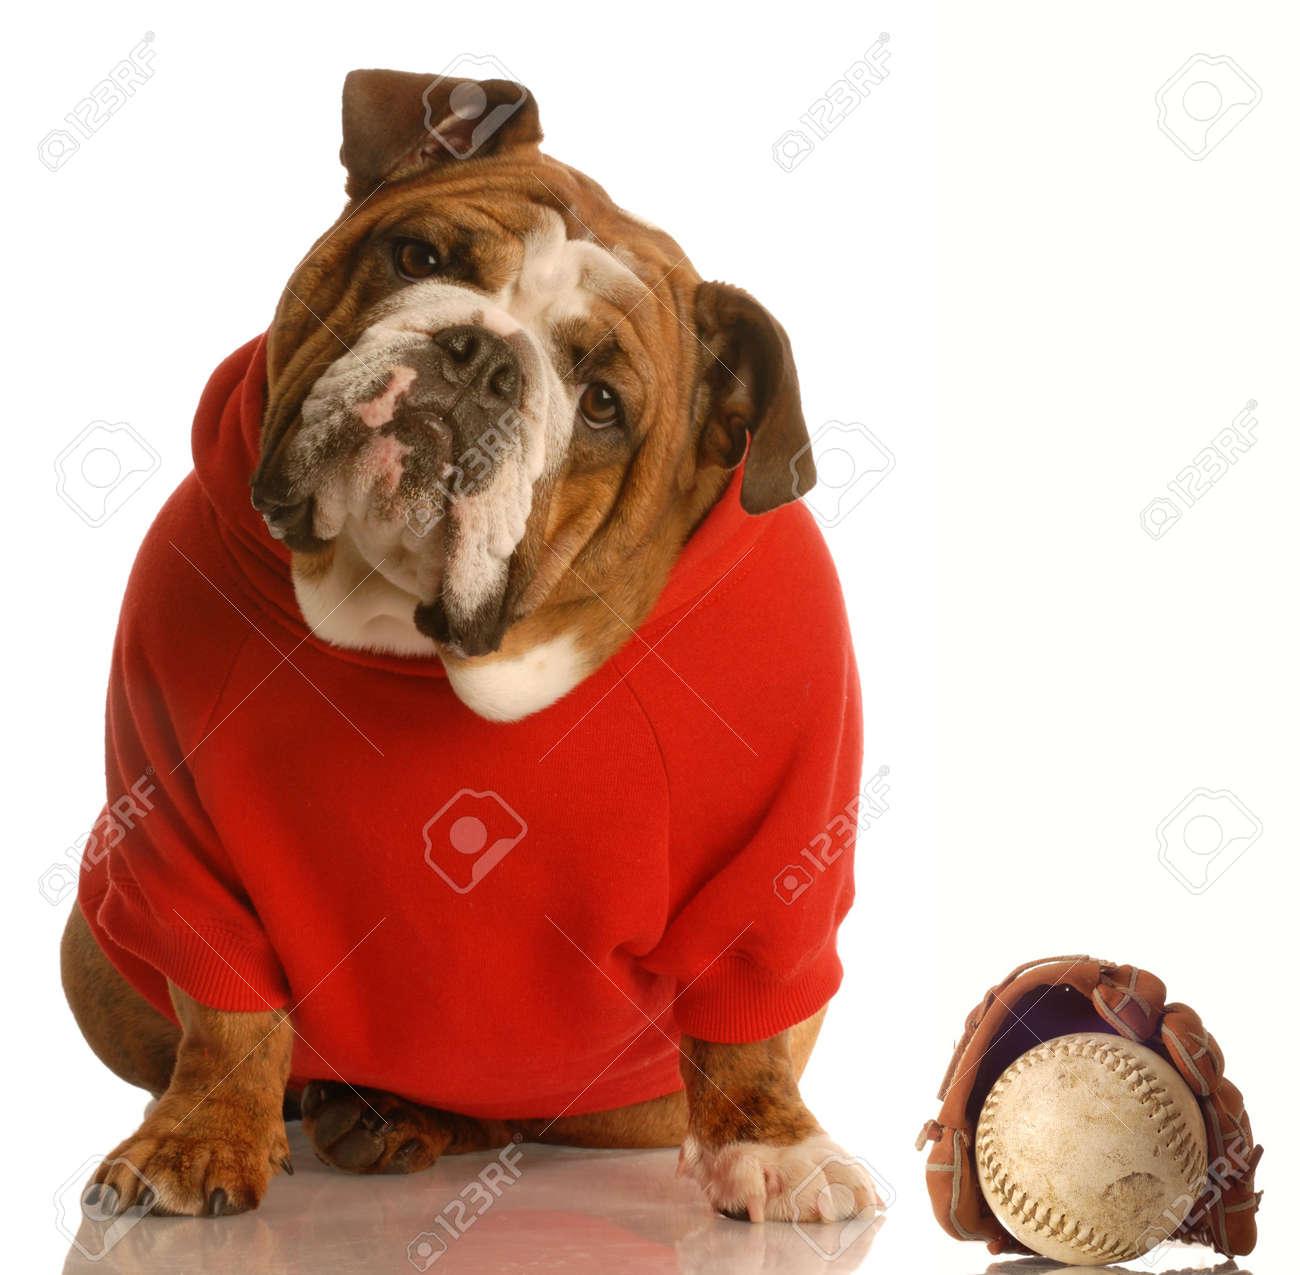 sports hound - english bulldog with baseball and glove Stock Photo - 4453262